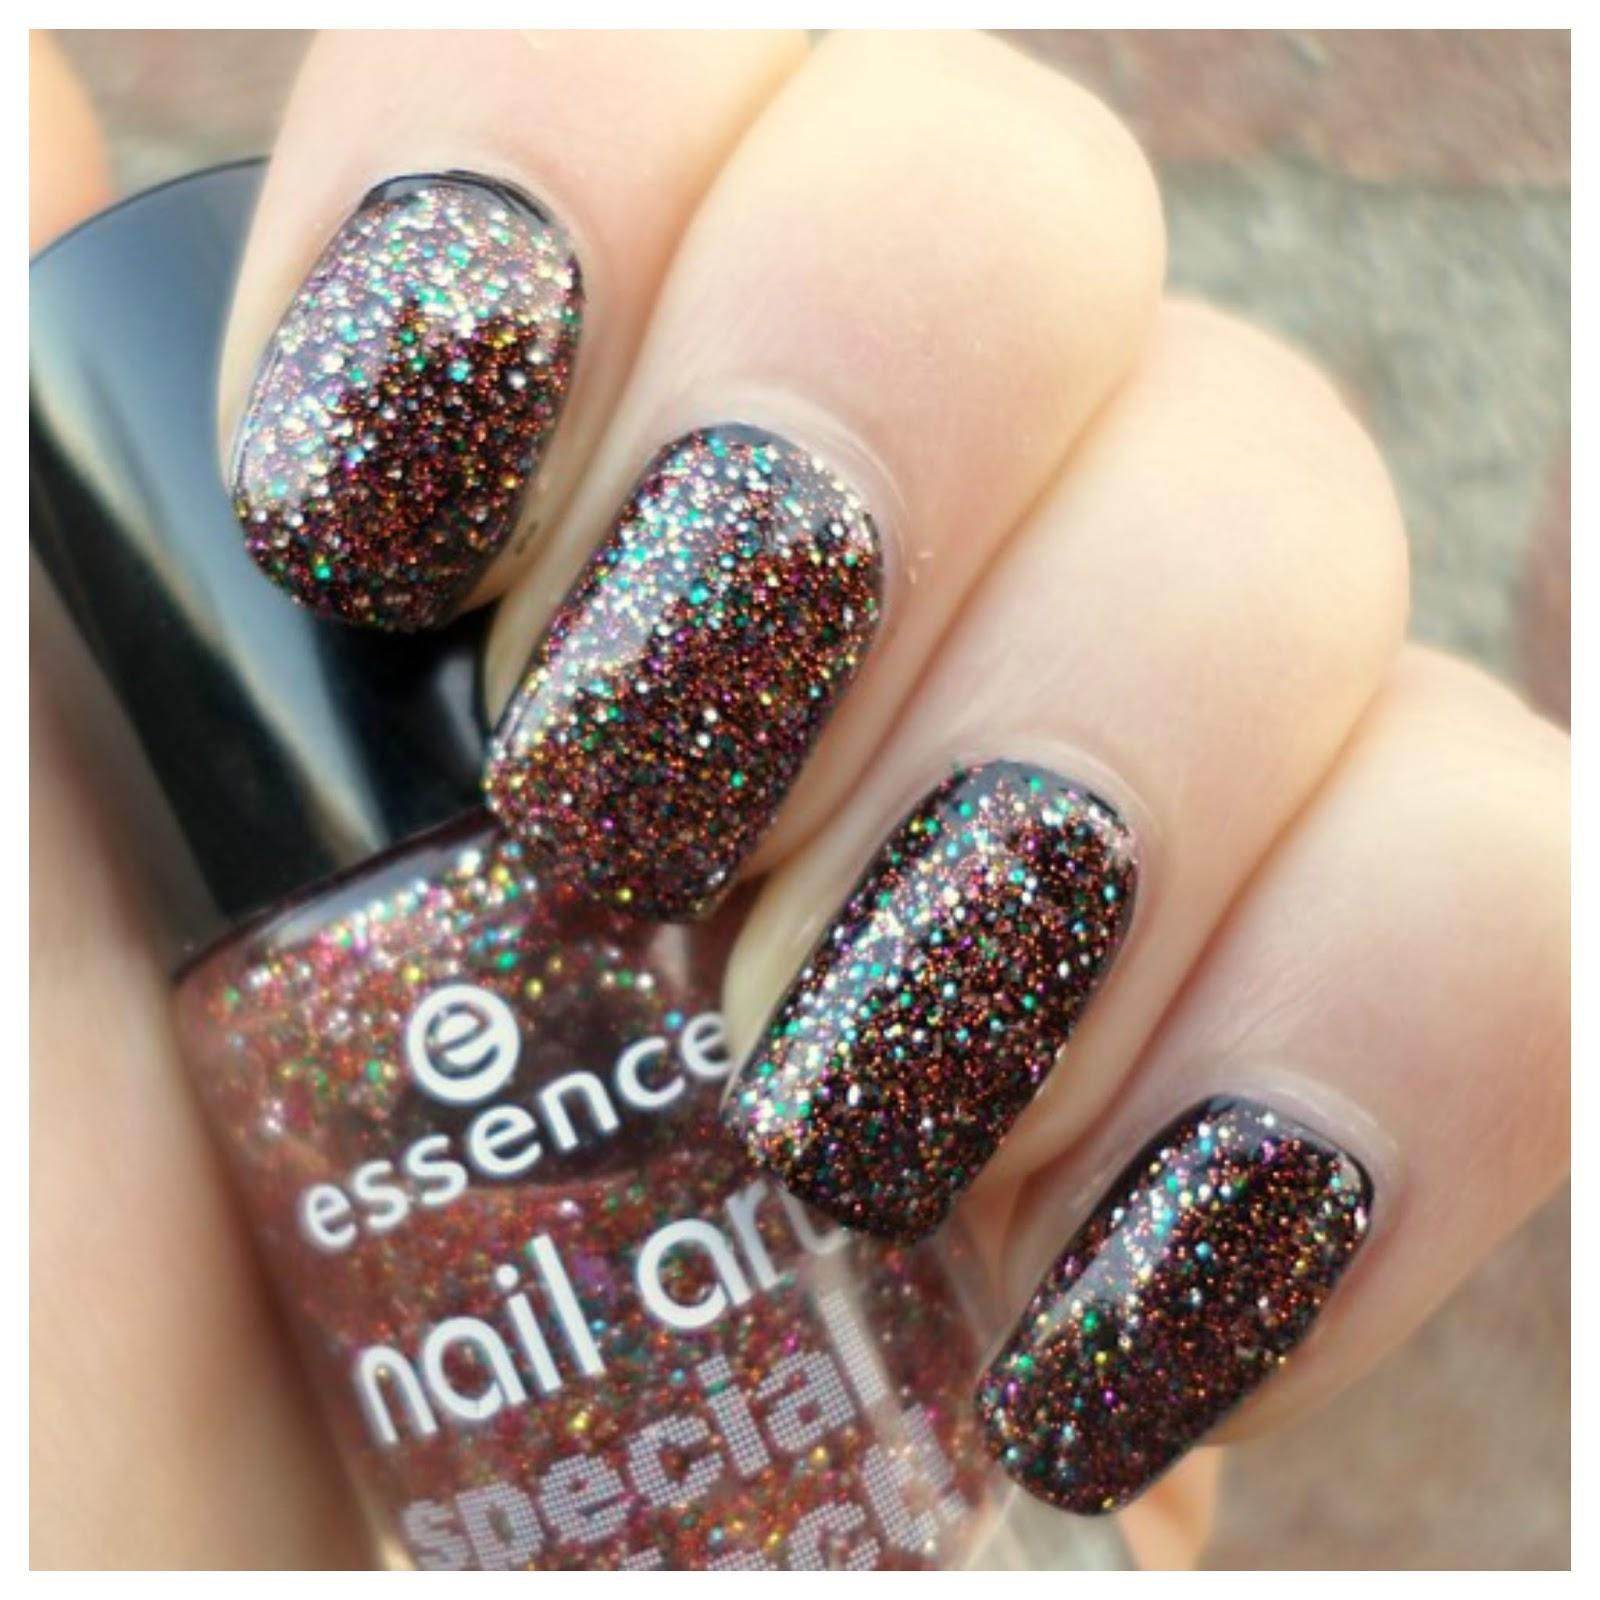 Creativenails4fun Review Essence Nail Art Effect Topcoat